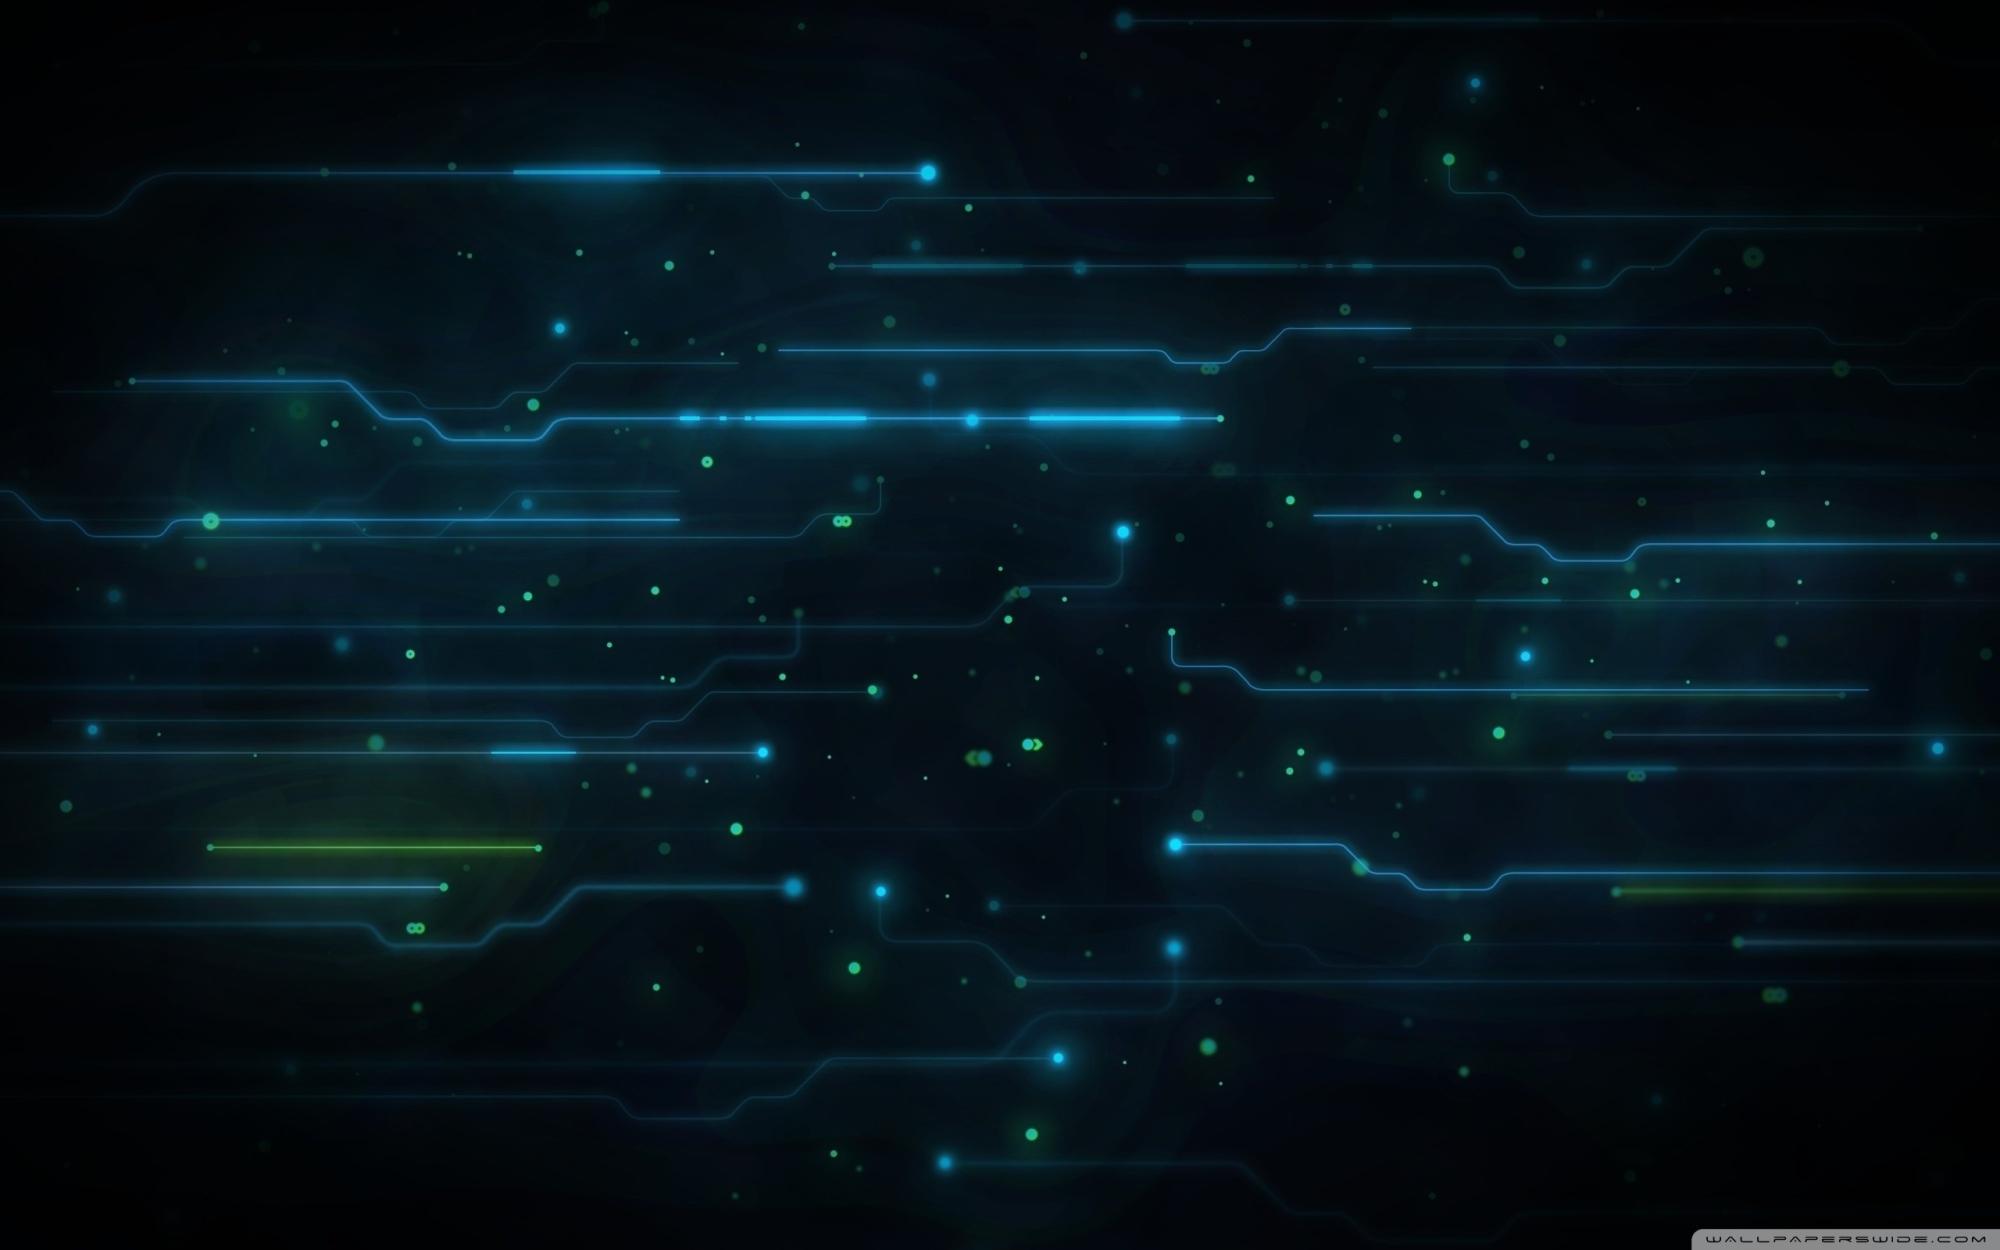 circuits_electronics_tron_lega_2560x1600_